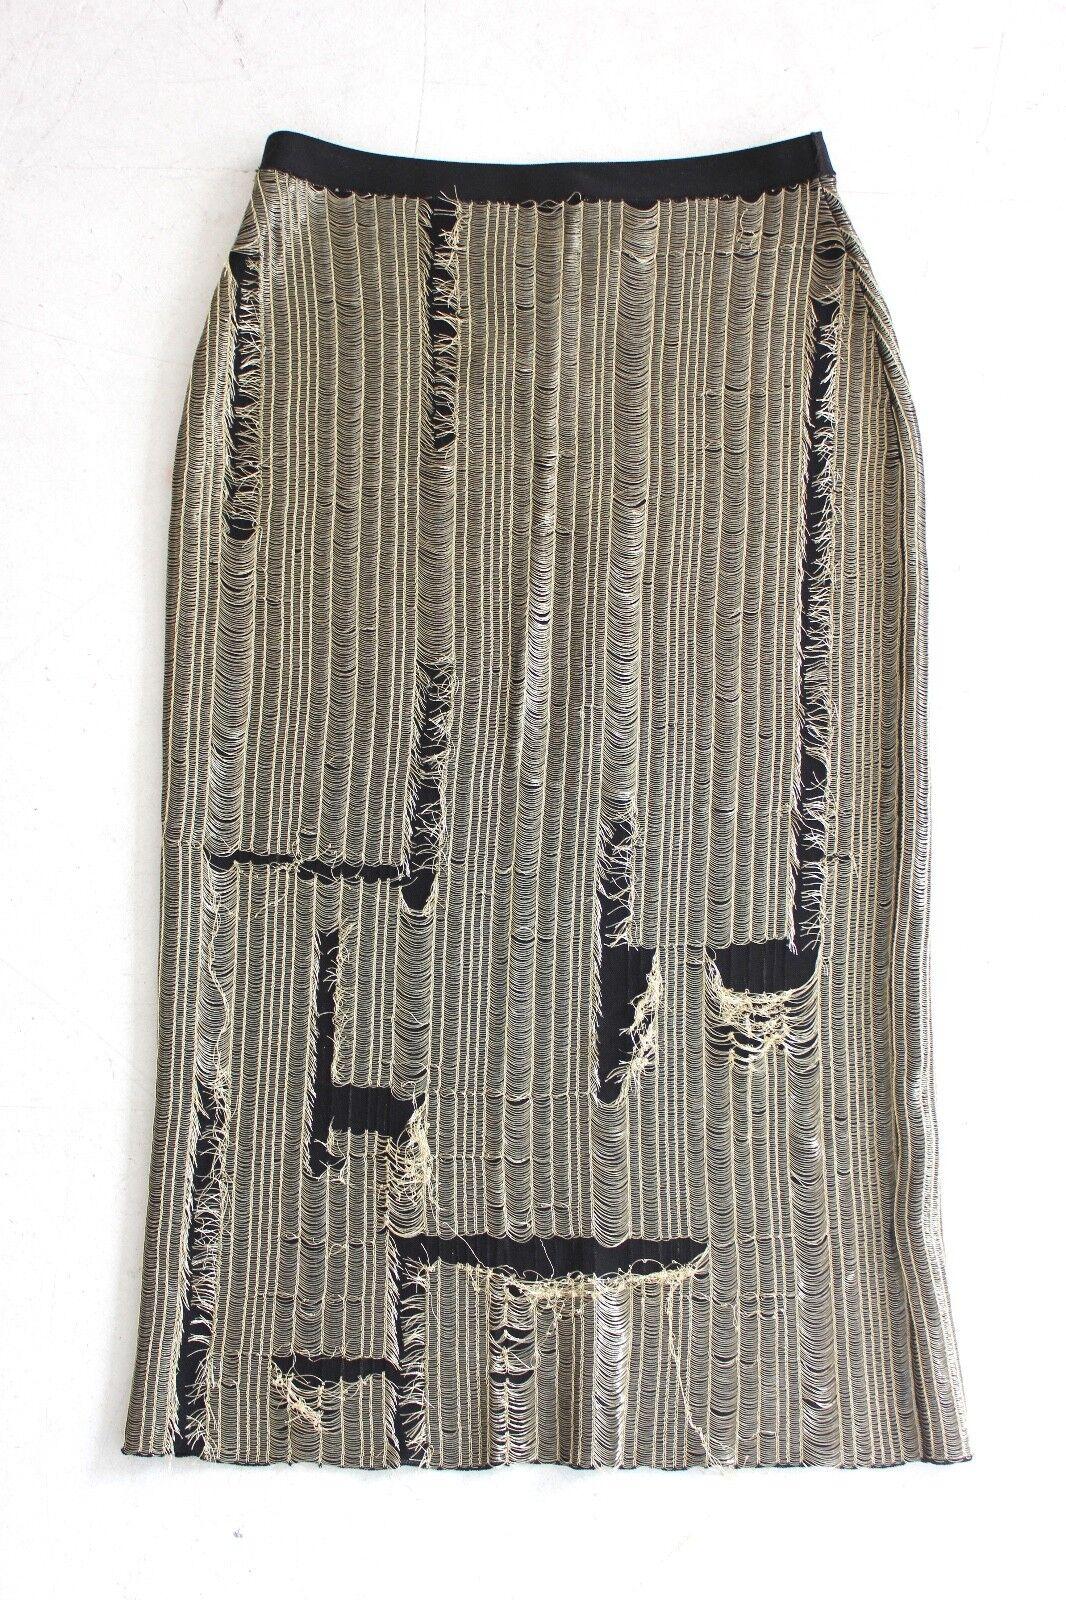 Maison Margiela Distressed Skirt gold Chain Midi length - Size Small